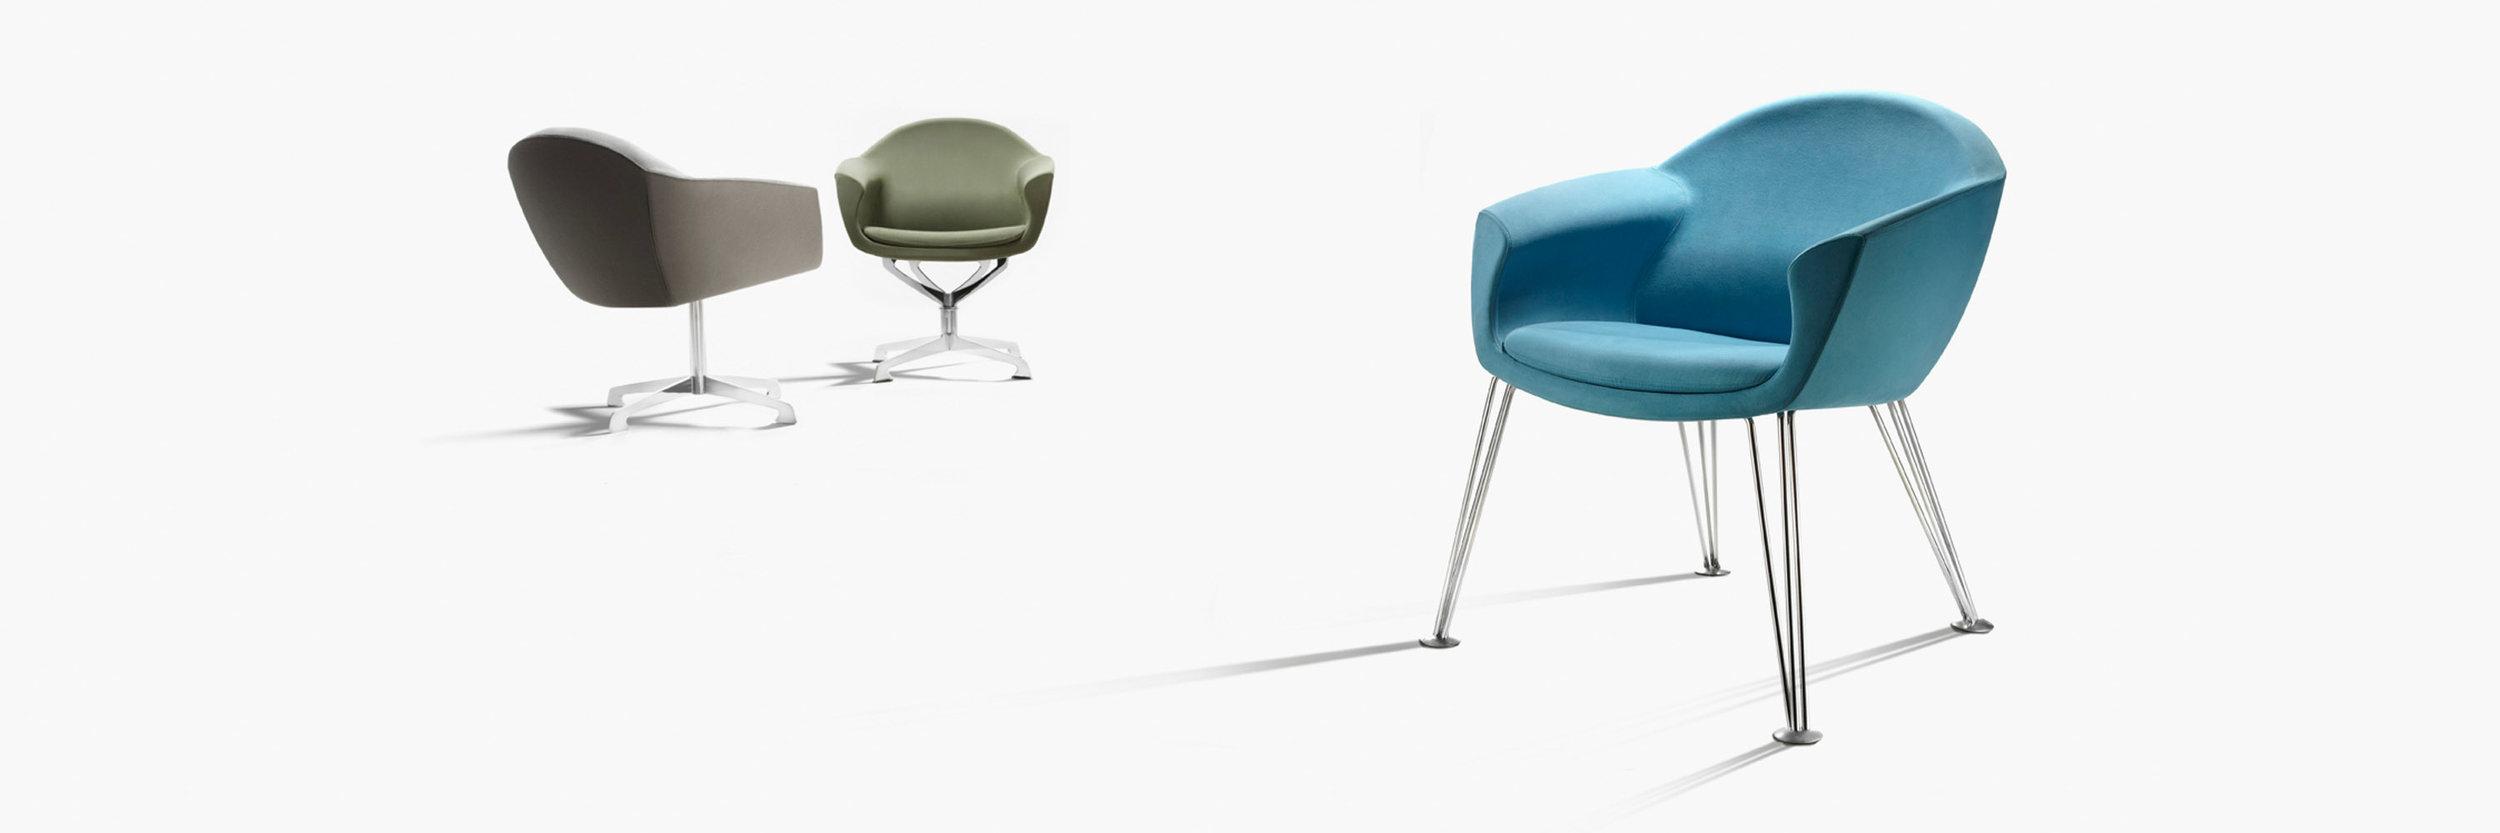 Jones-and-Partners-Mortimer-seating-armchair-final.jpg